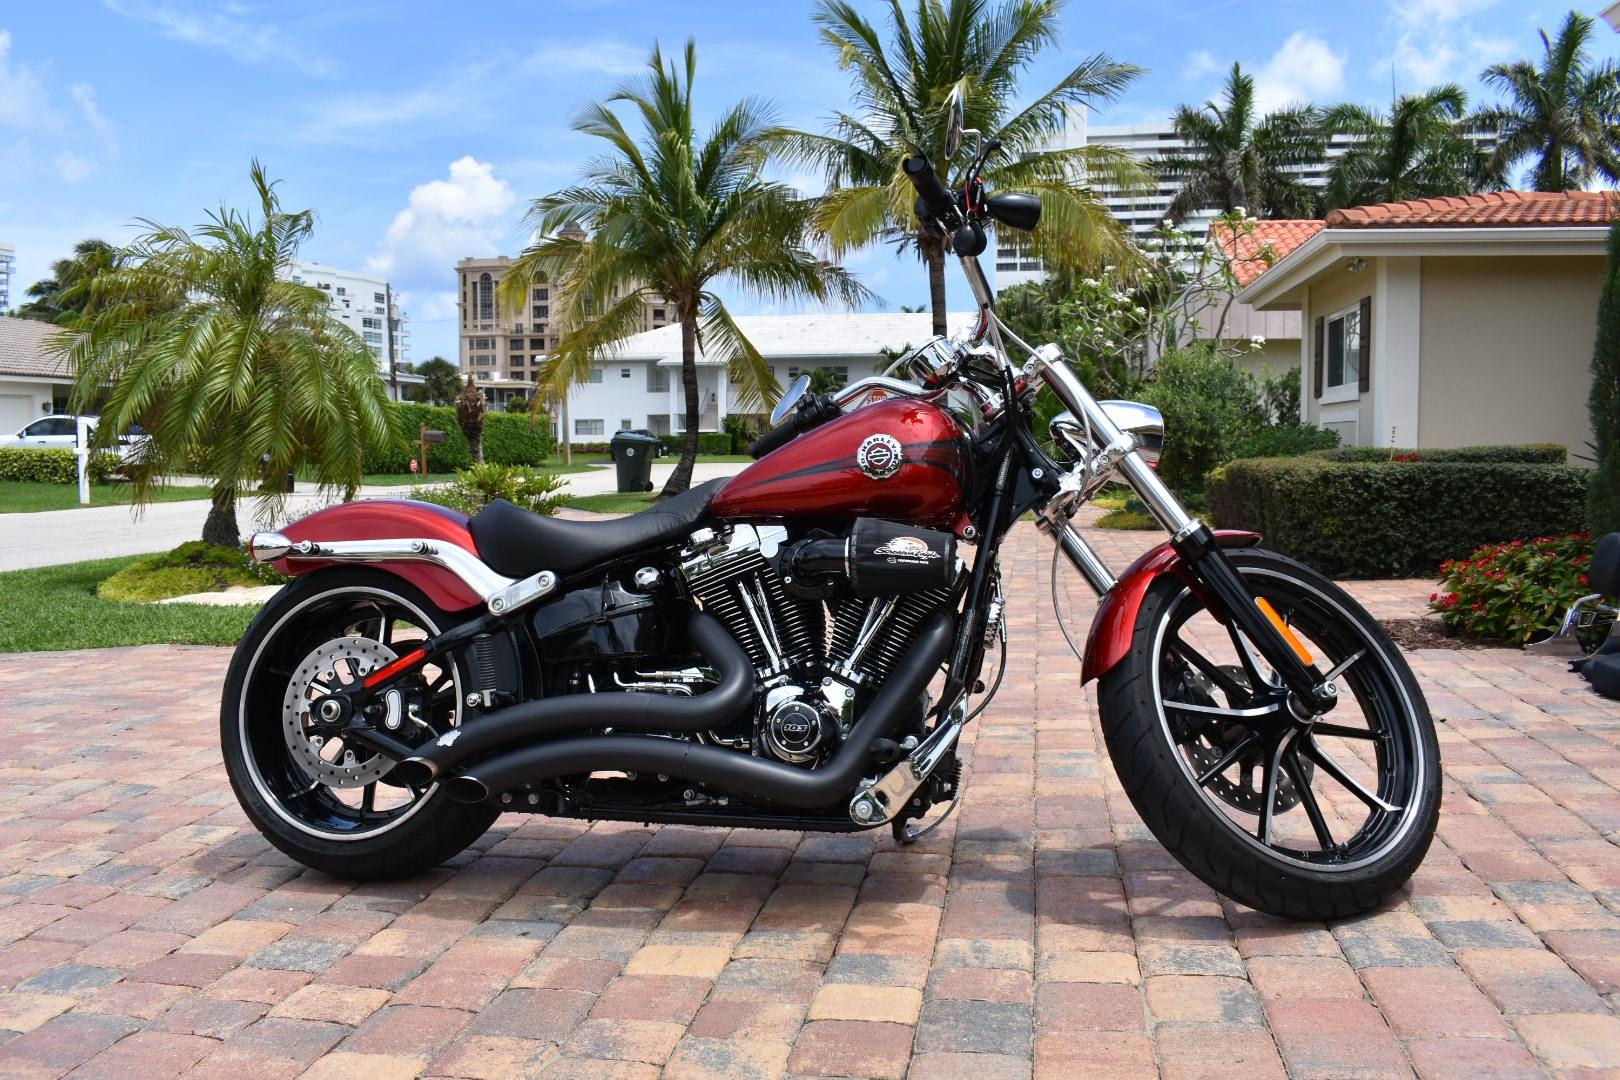 Harley Davidson Dyna For Sale San Diego >> All New & Used Harley-Davidson® Softail Breakout® For Sale (709 Bikes, Page 1) | ChopperExchange